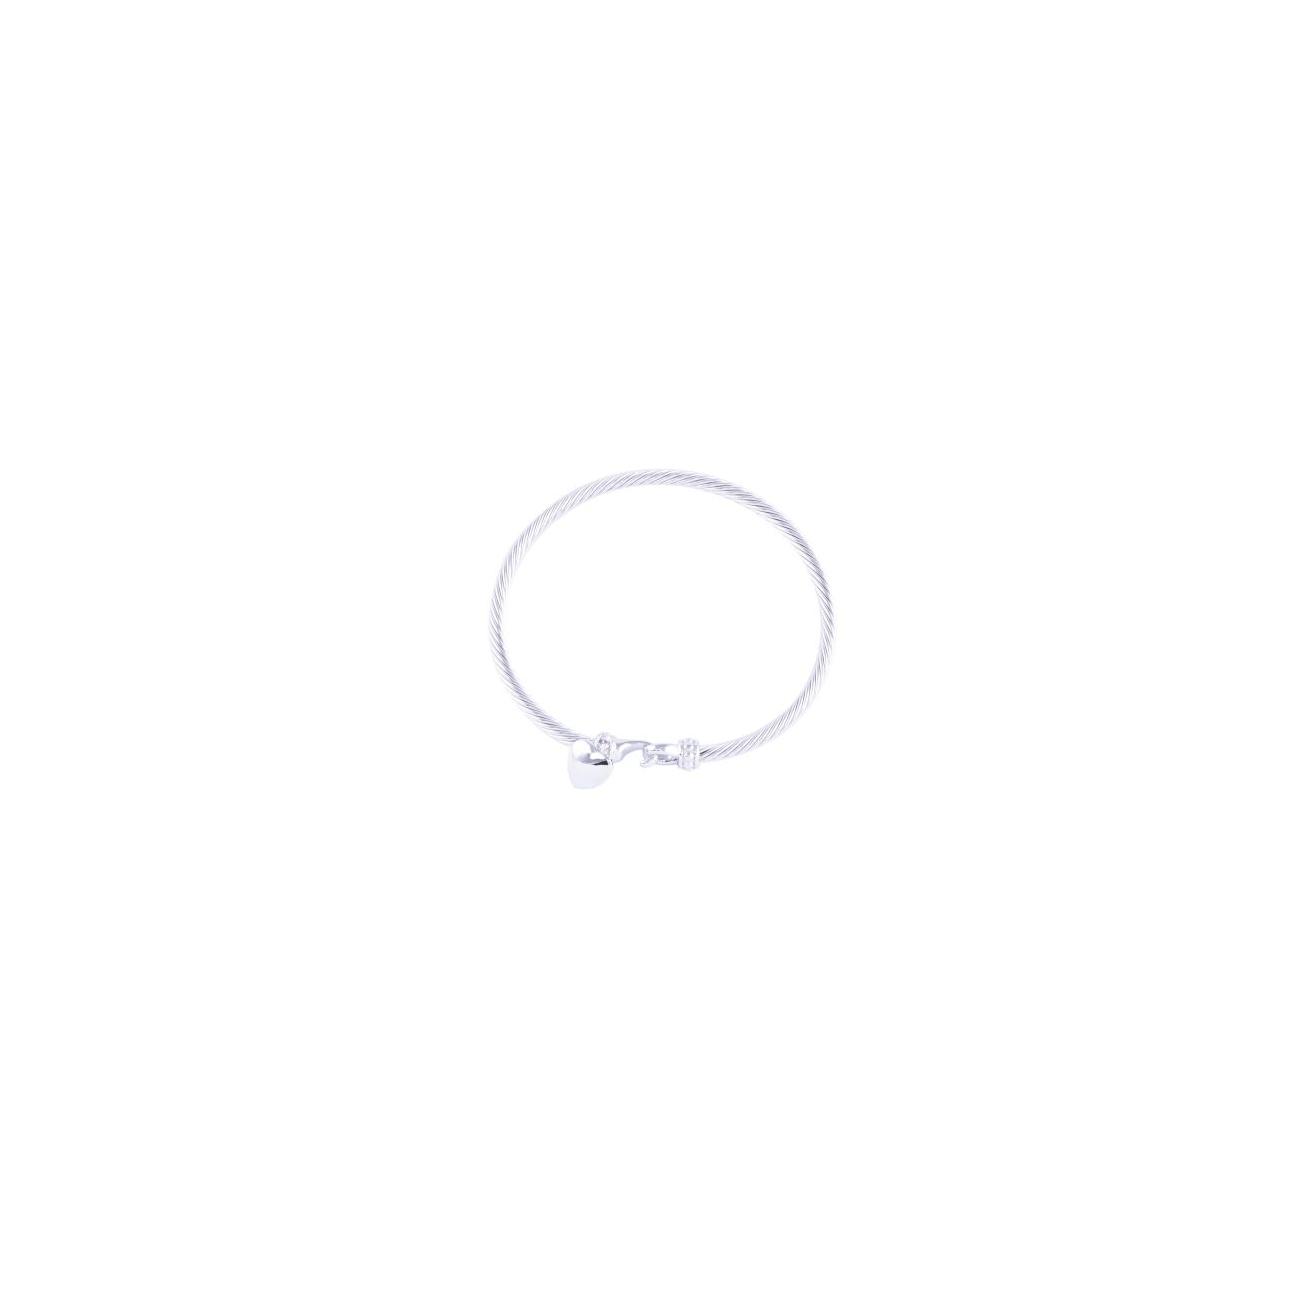 Bangle with heart pendant